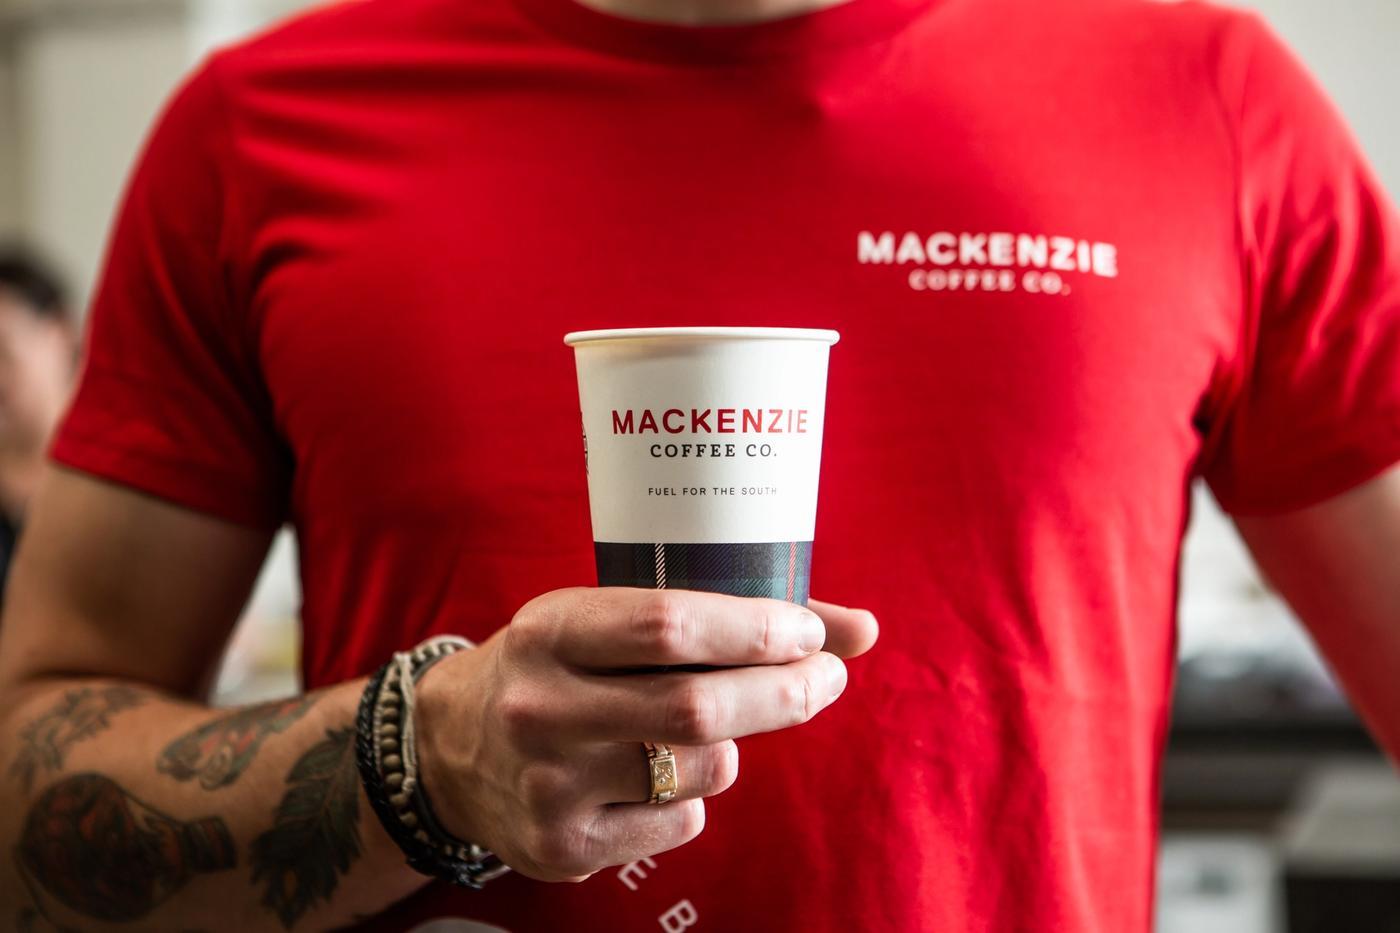 Mackenzie Coffee Co Cup in hand